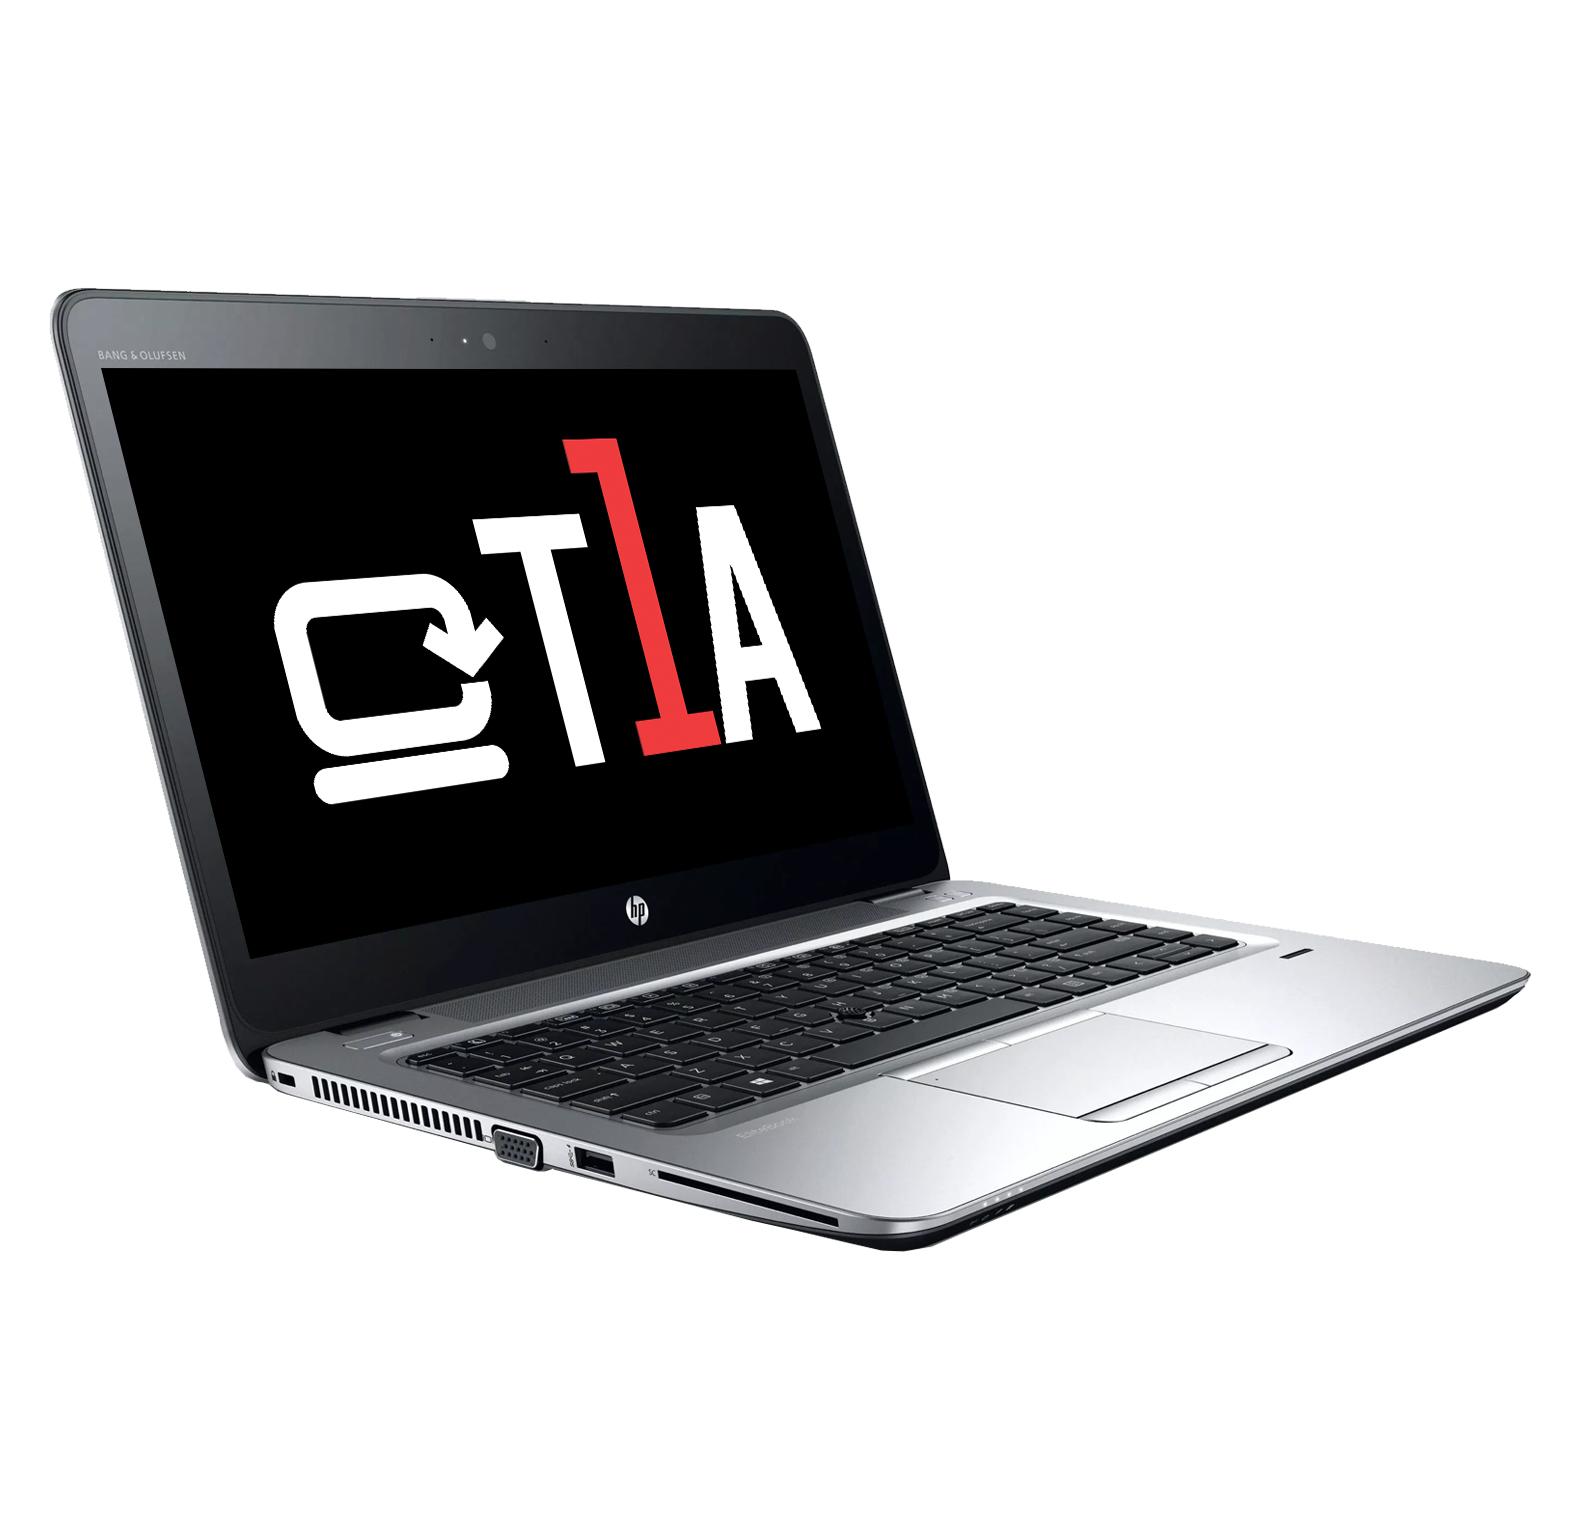 T1A L-EB840G3-UK-T004 notebook DDR4-SDRAM 35.6 cm (14